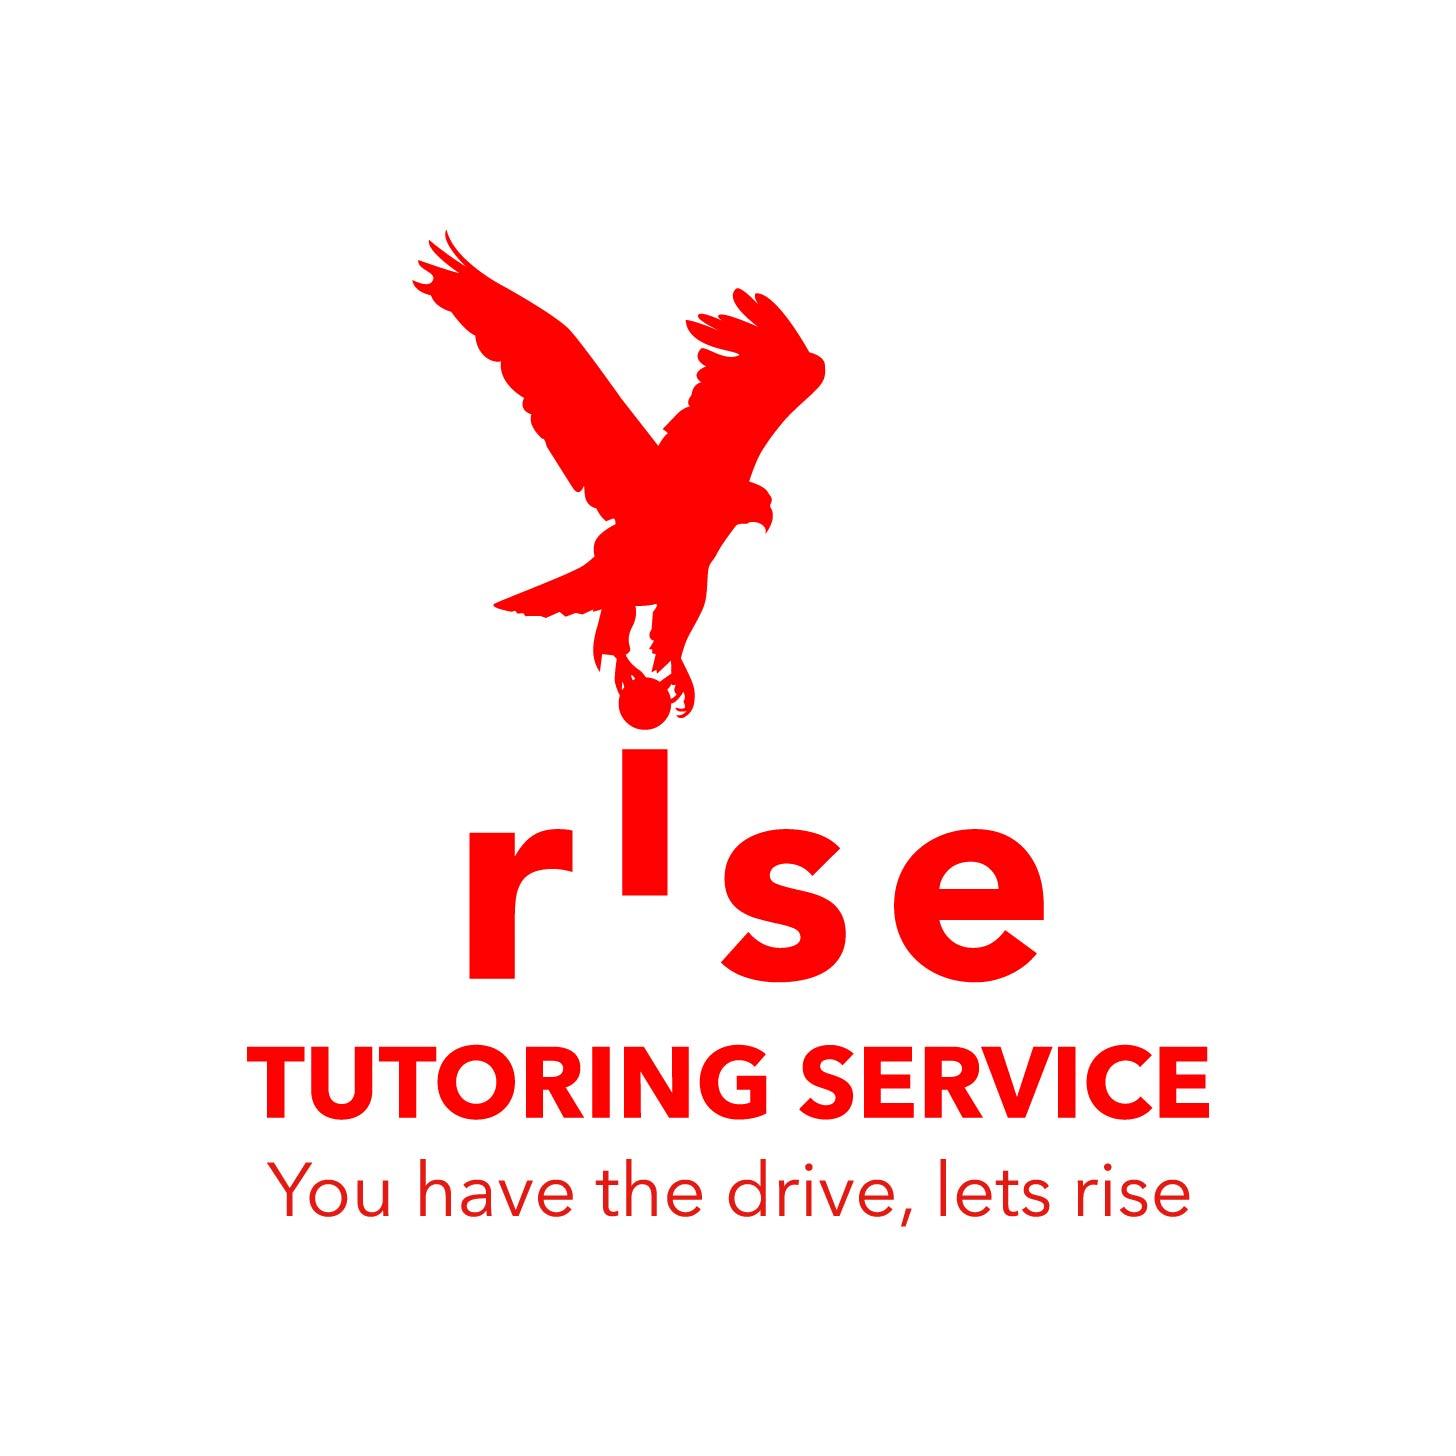 Logo Design by Cross Desain - Entry No. 193 in the Logo Design Contest Imaginative Logo Design for Rise Tutoring Service.